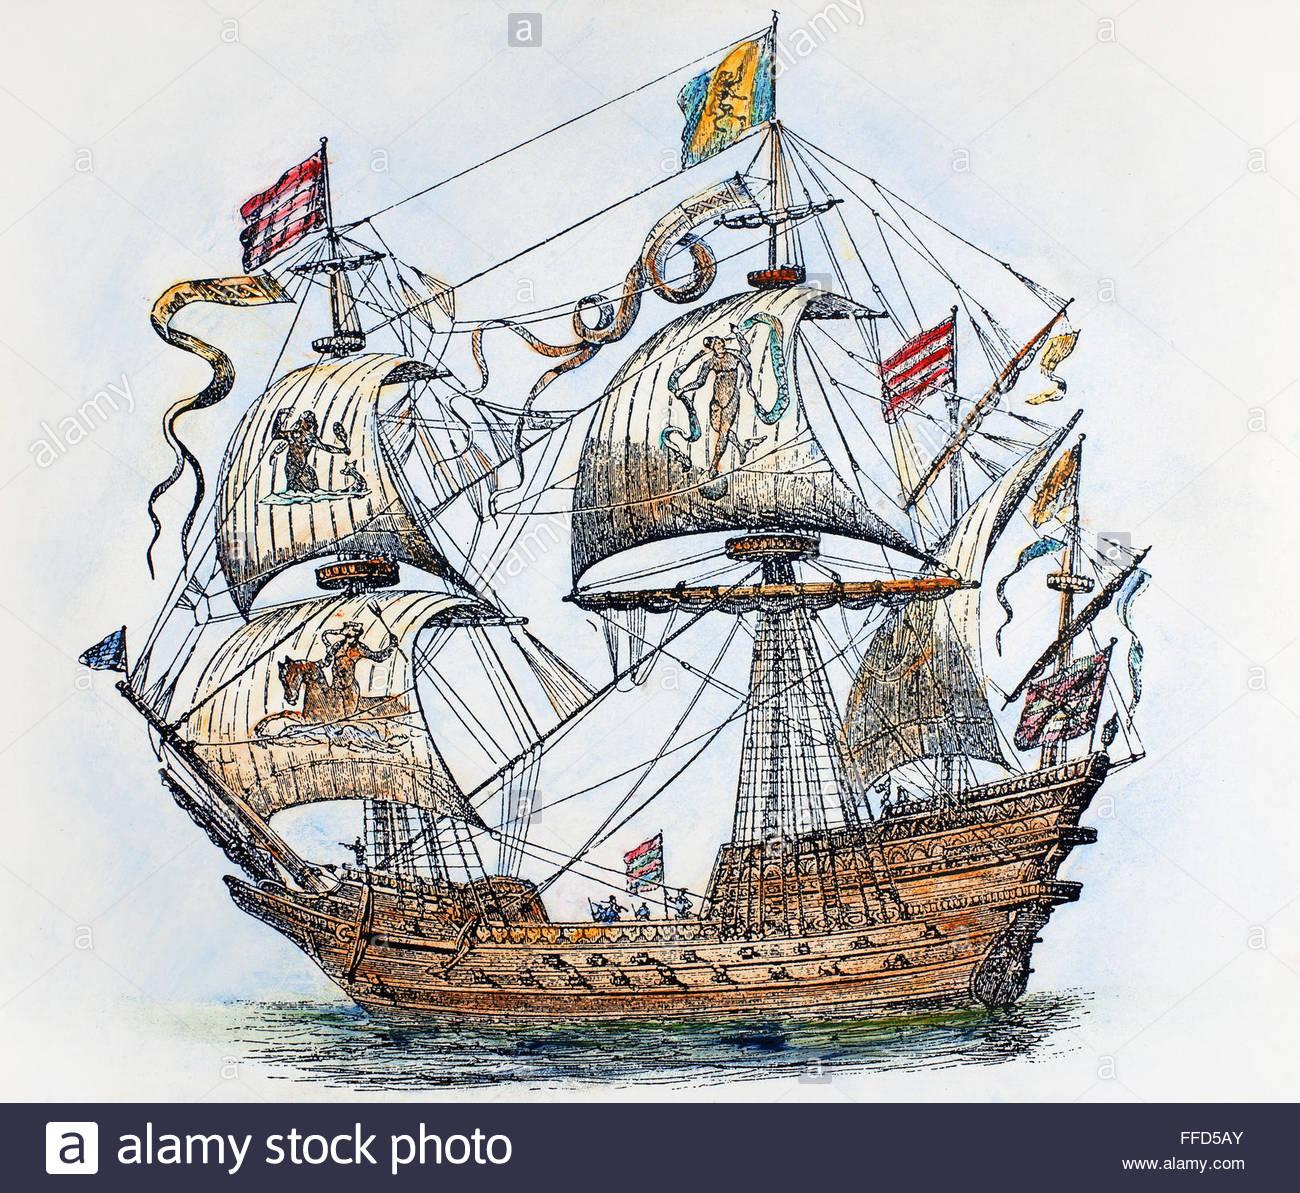 1300x1193 Spanish Galleon, 1588. Na Galleon From The Spanish Armada Of 1588